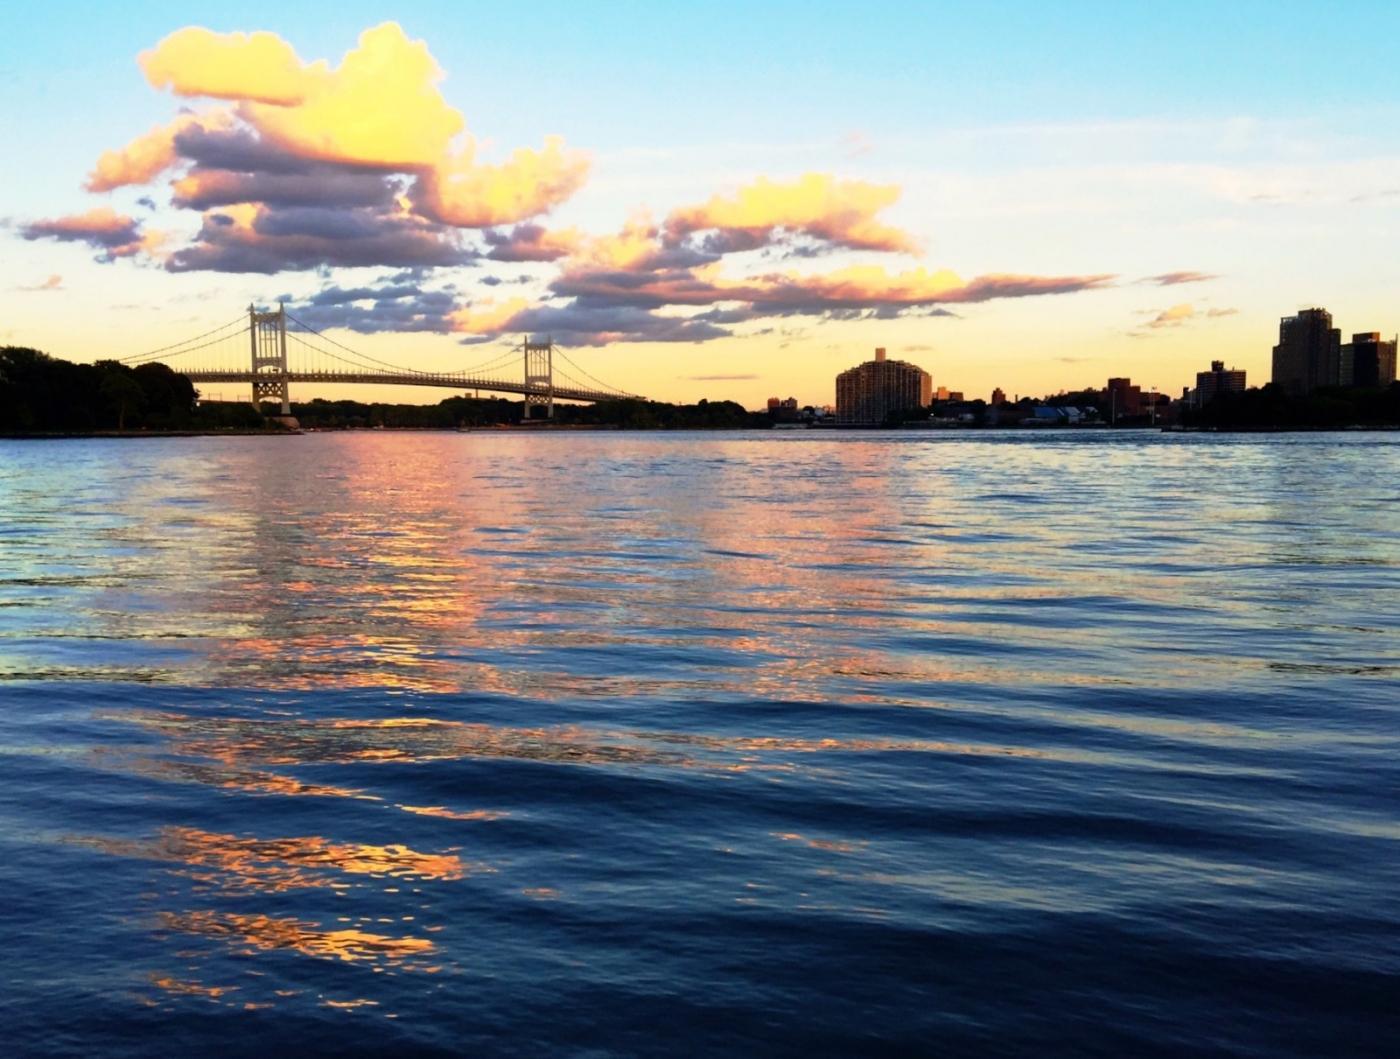 回头一瞅 美在东河 Manhattan East River_图1-23